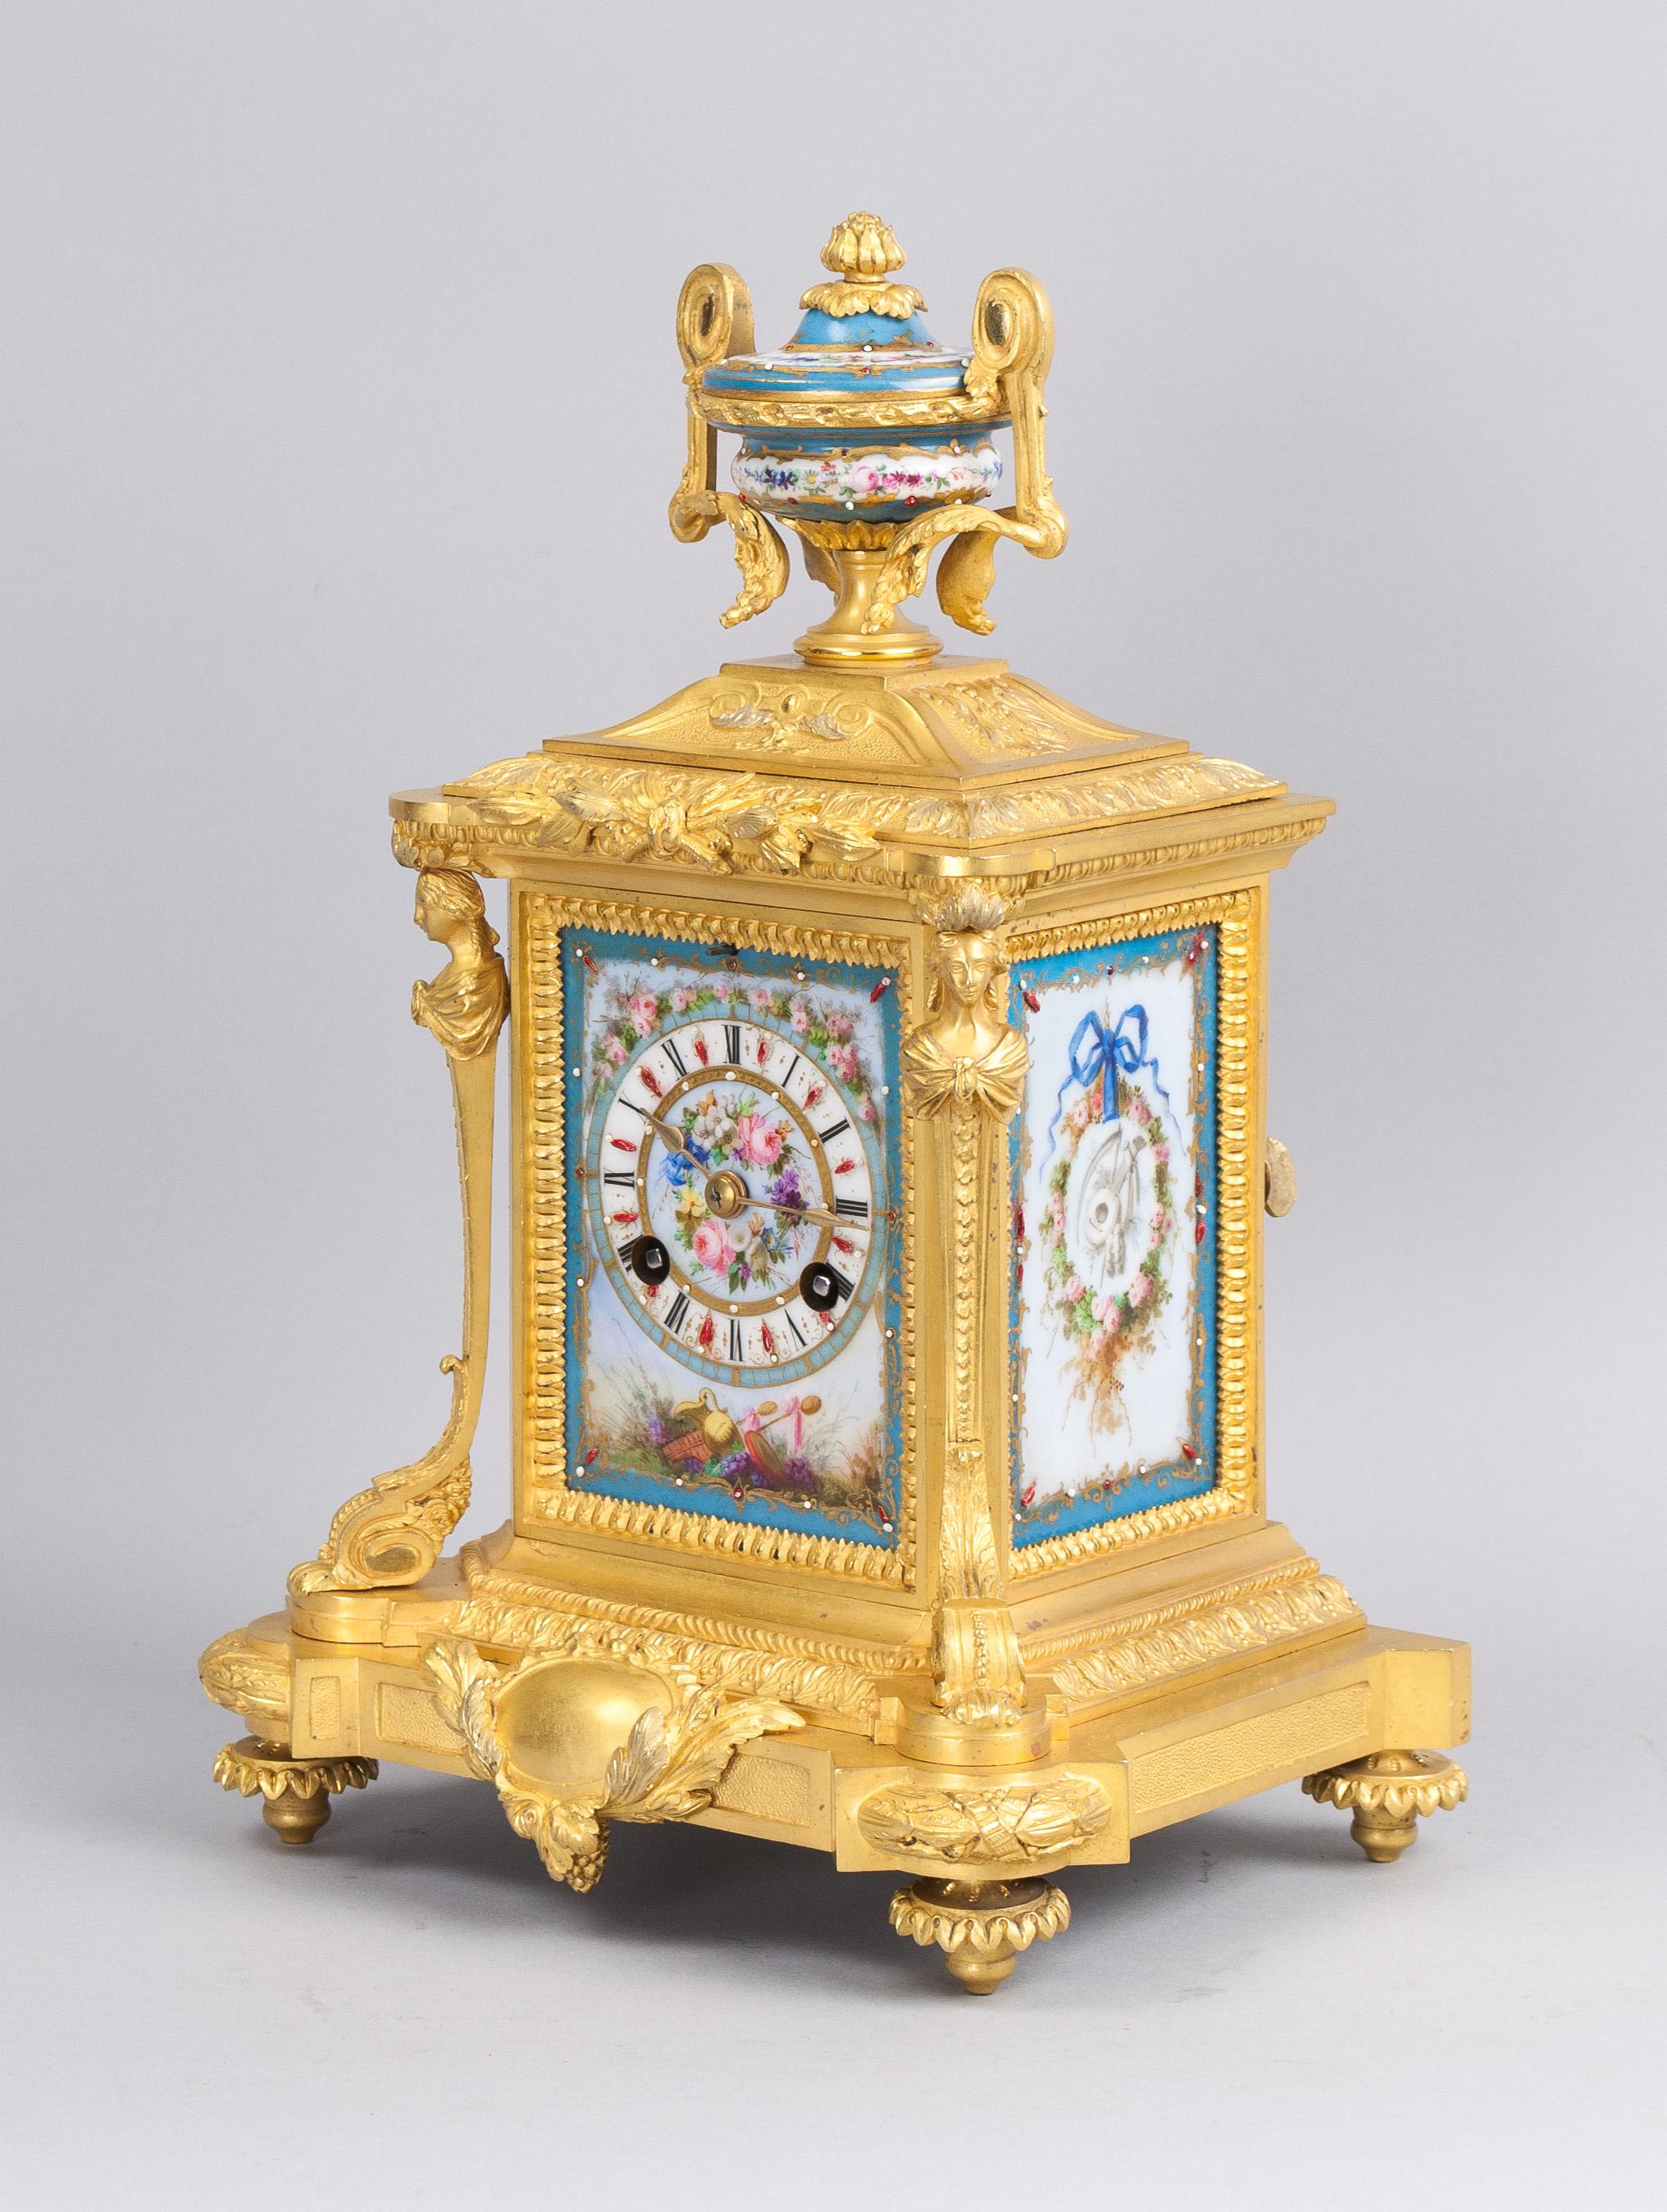 Story Antique Clocks image (4 of 11)